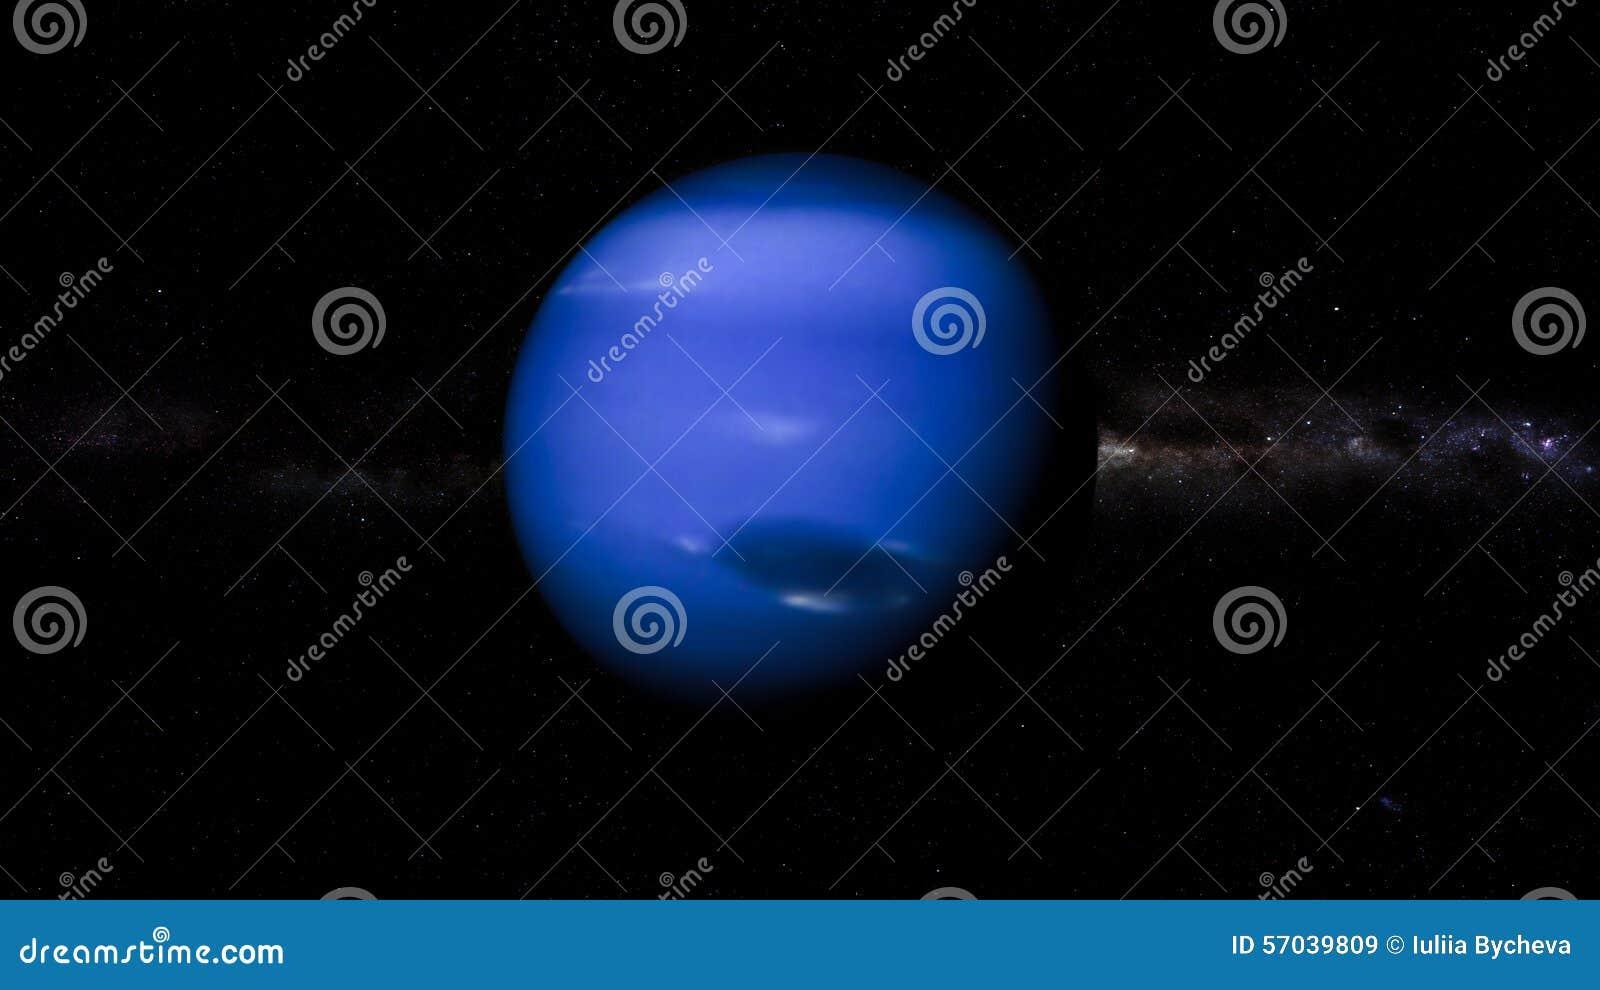 neptune planet travel - photo #30